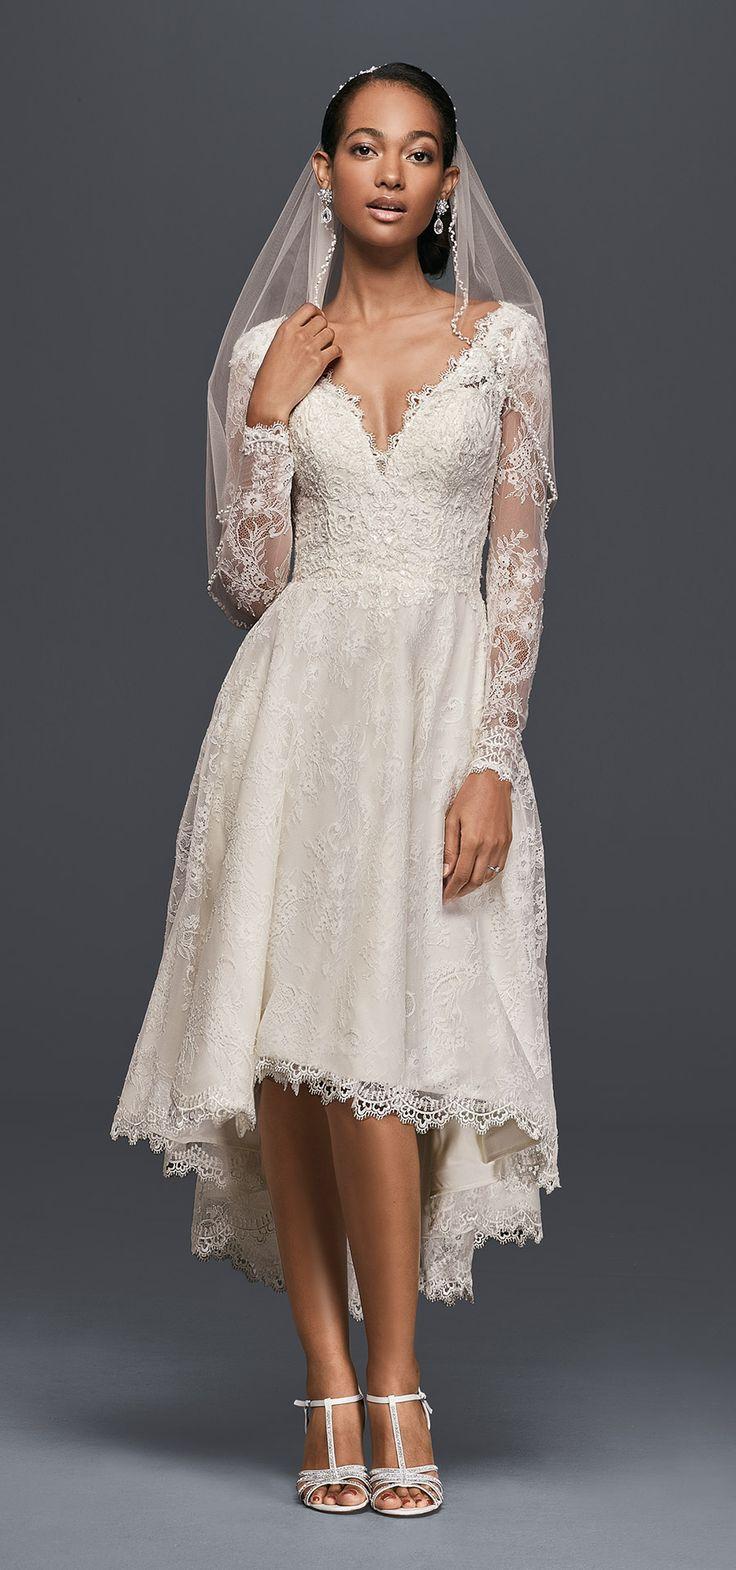 25 Best Ideas About David Bridal Wedding Dresses On Pinterest